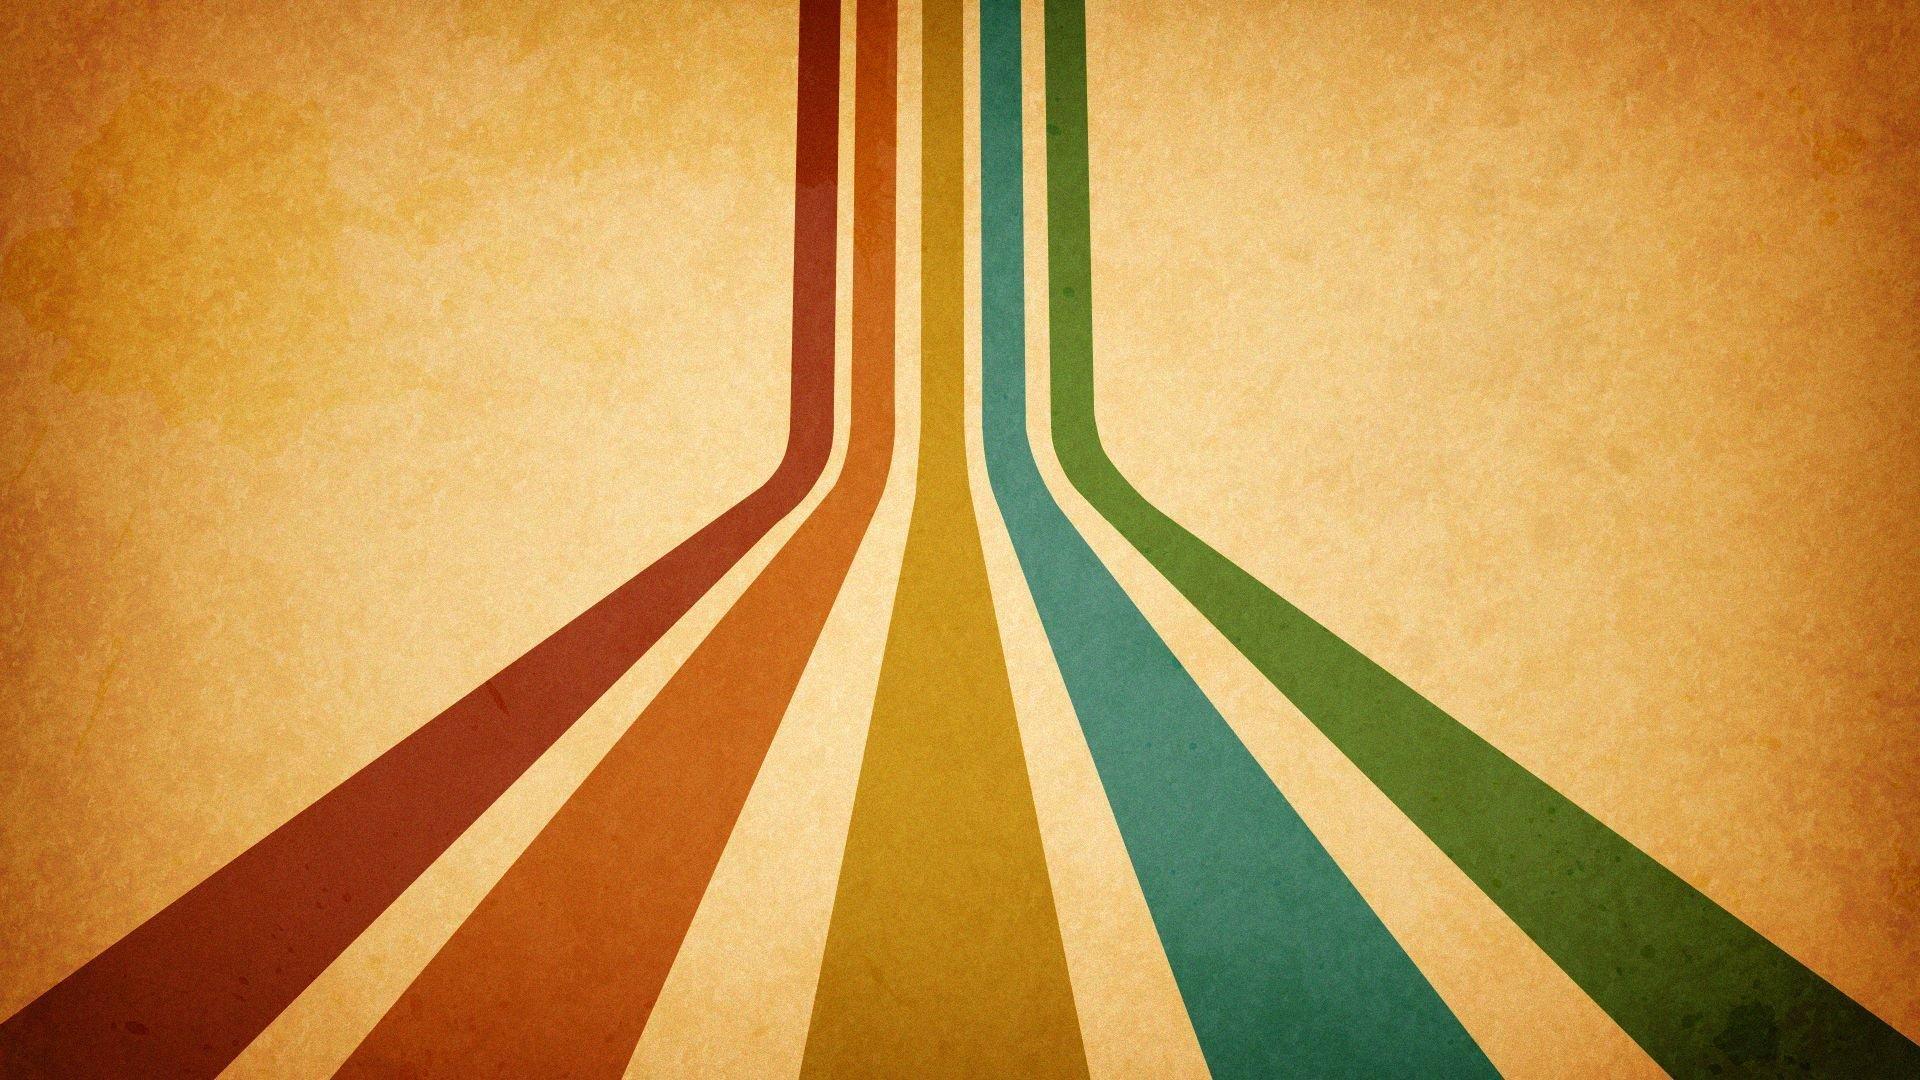 70's Wallpapers - Wallpaper Cave